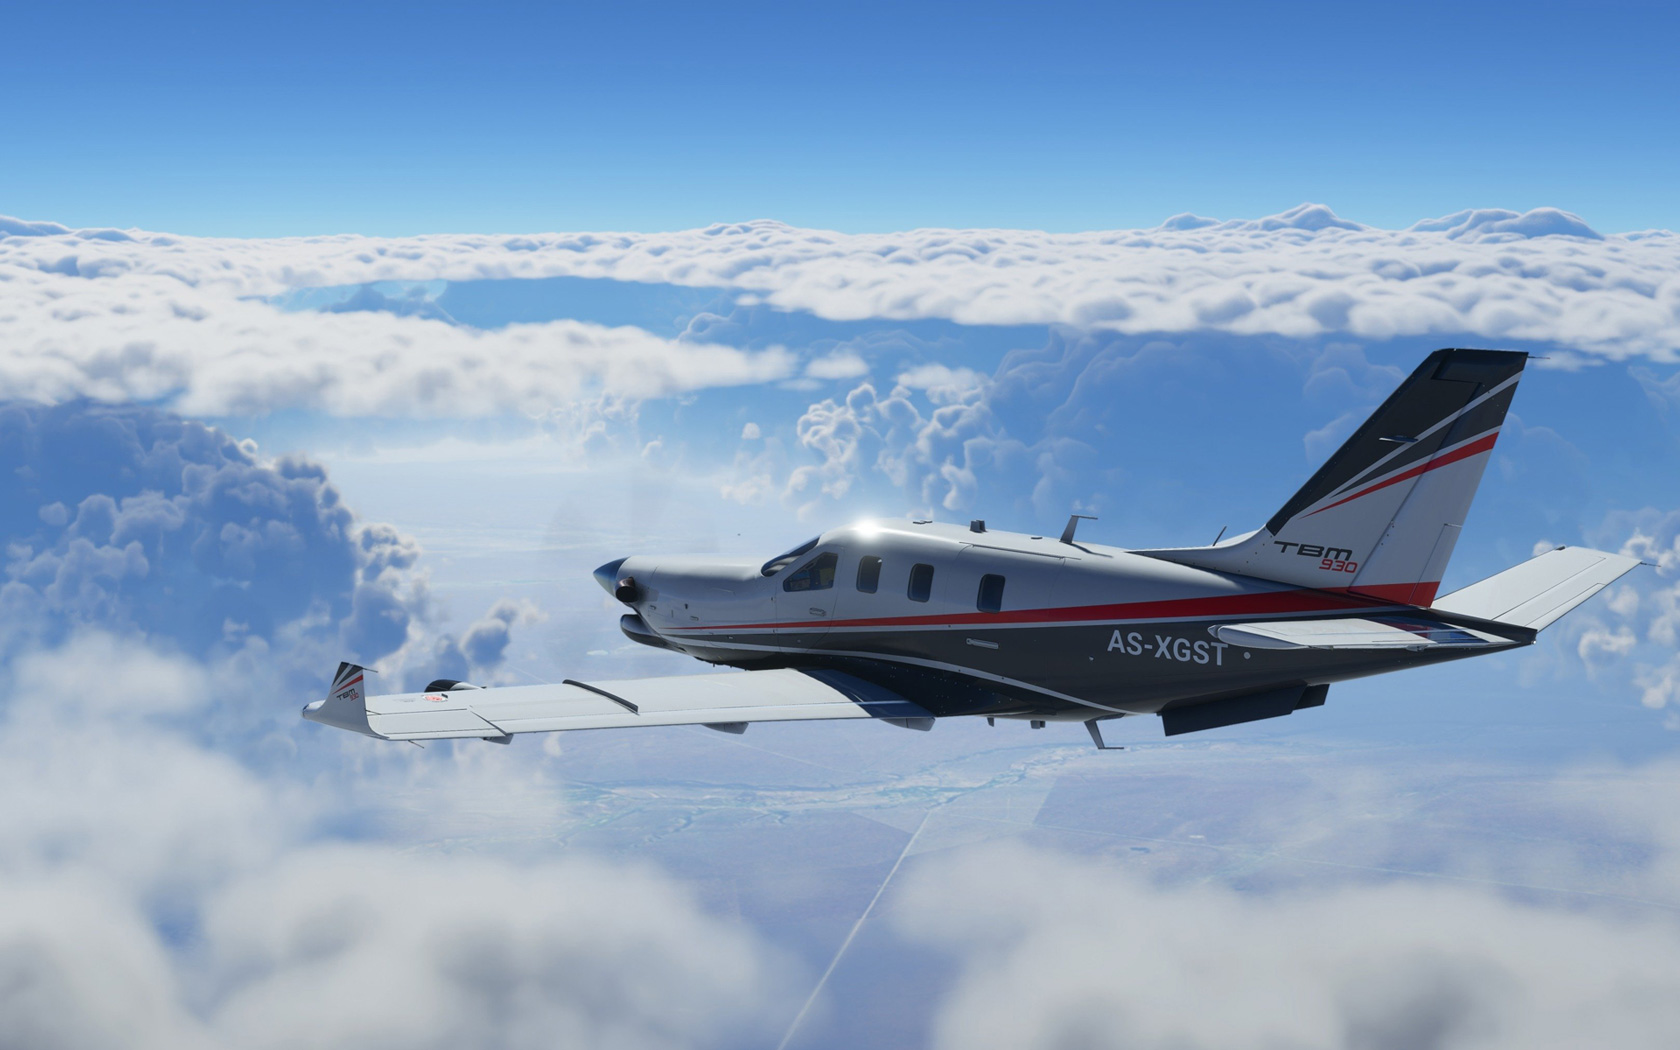 Microsoft Flight Simulator (2020) Wallpaper in 1680x1050